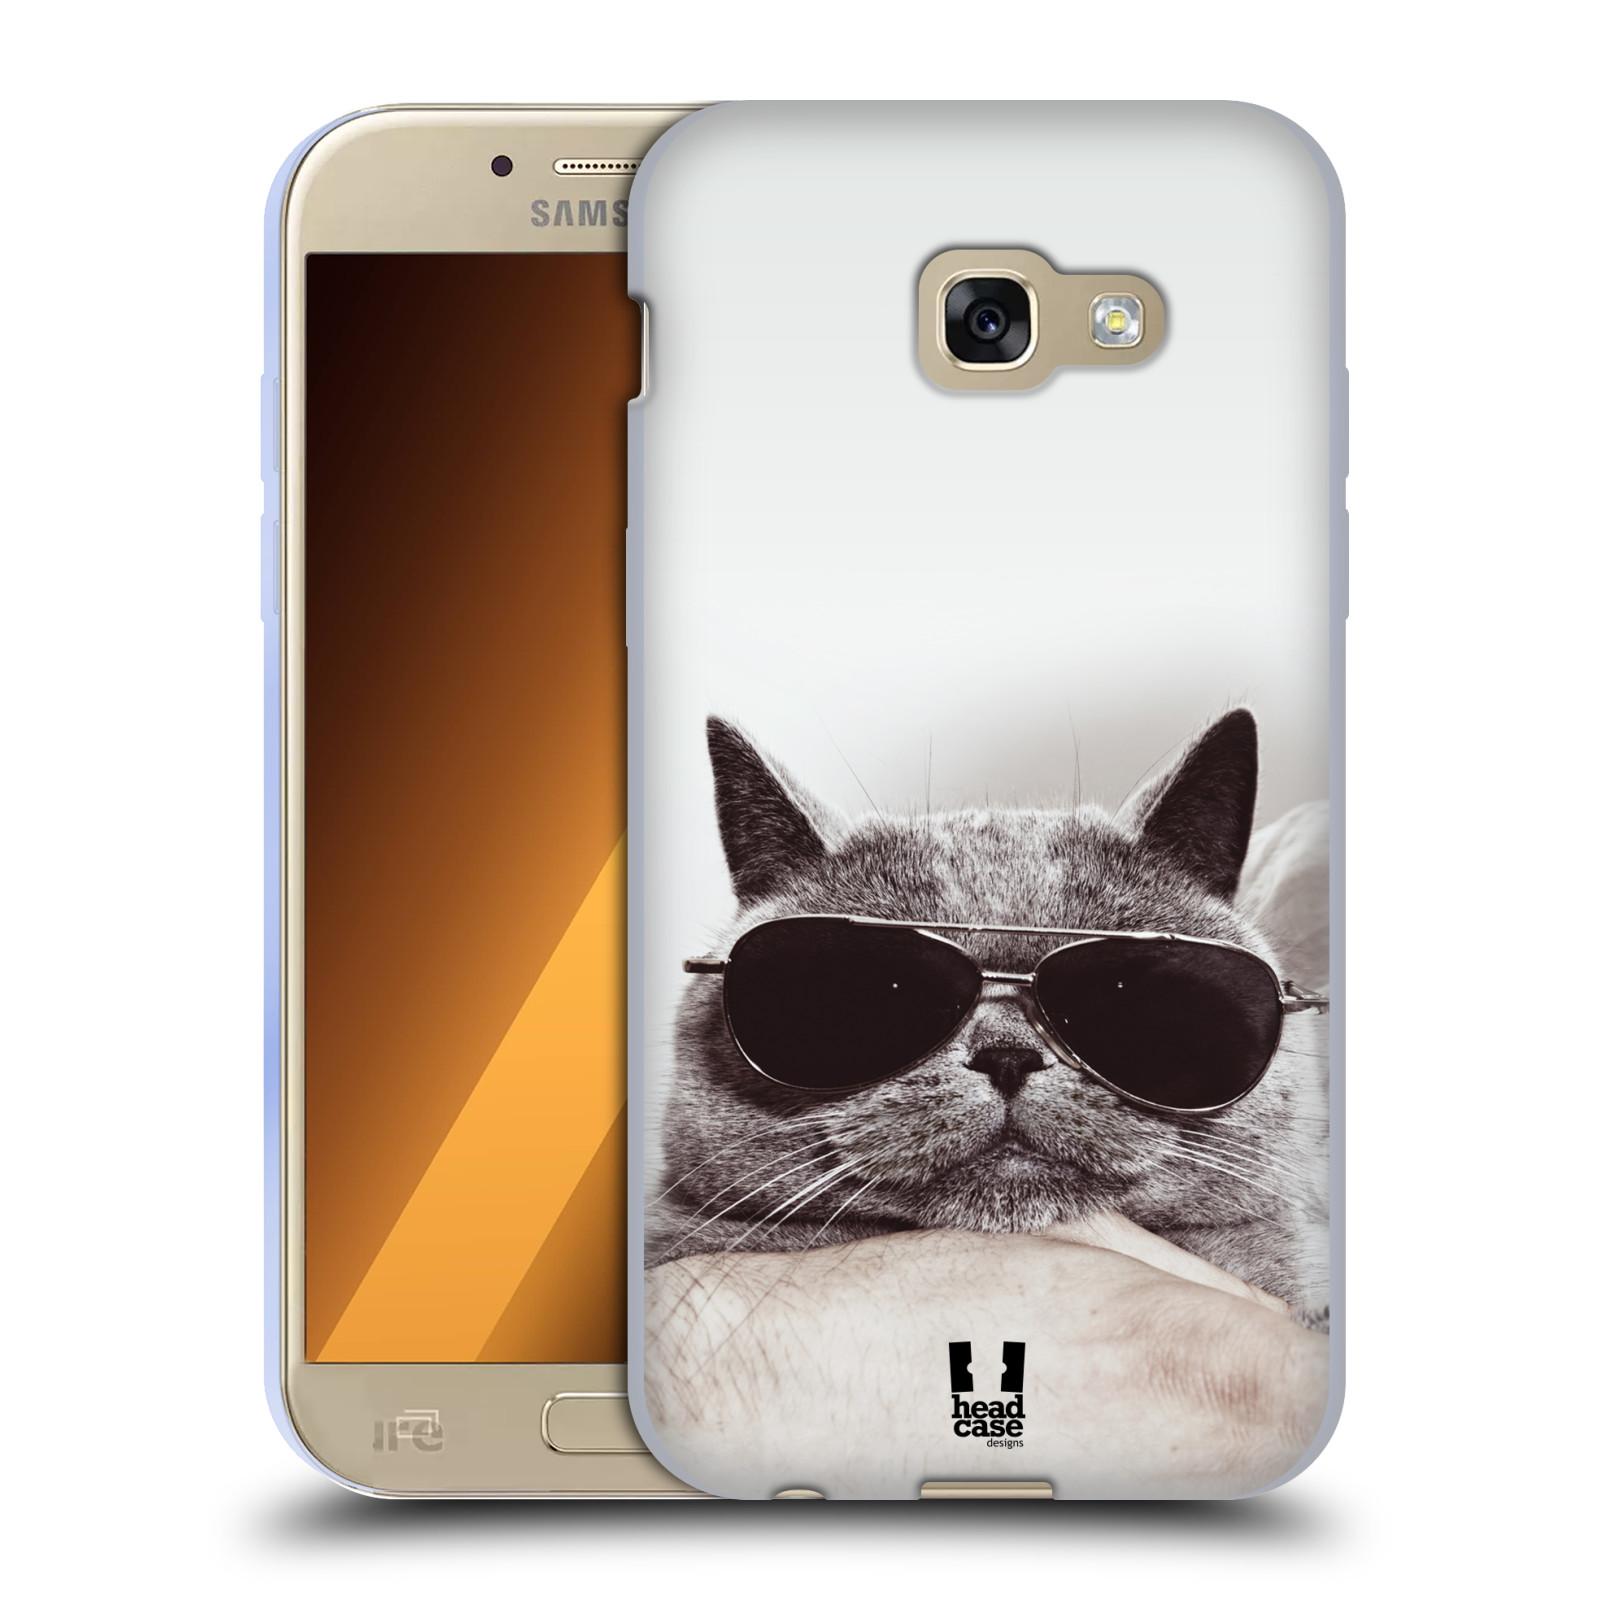 Silikonové pouzdro na mobil Samsung Galaxy A5 (2017) HEAD CASE KOTĚ S BRÝLEMI (Silikonový kryt či obal na mobilní telefon Samsung Galaxy A5 2017 SM-A520)